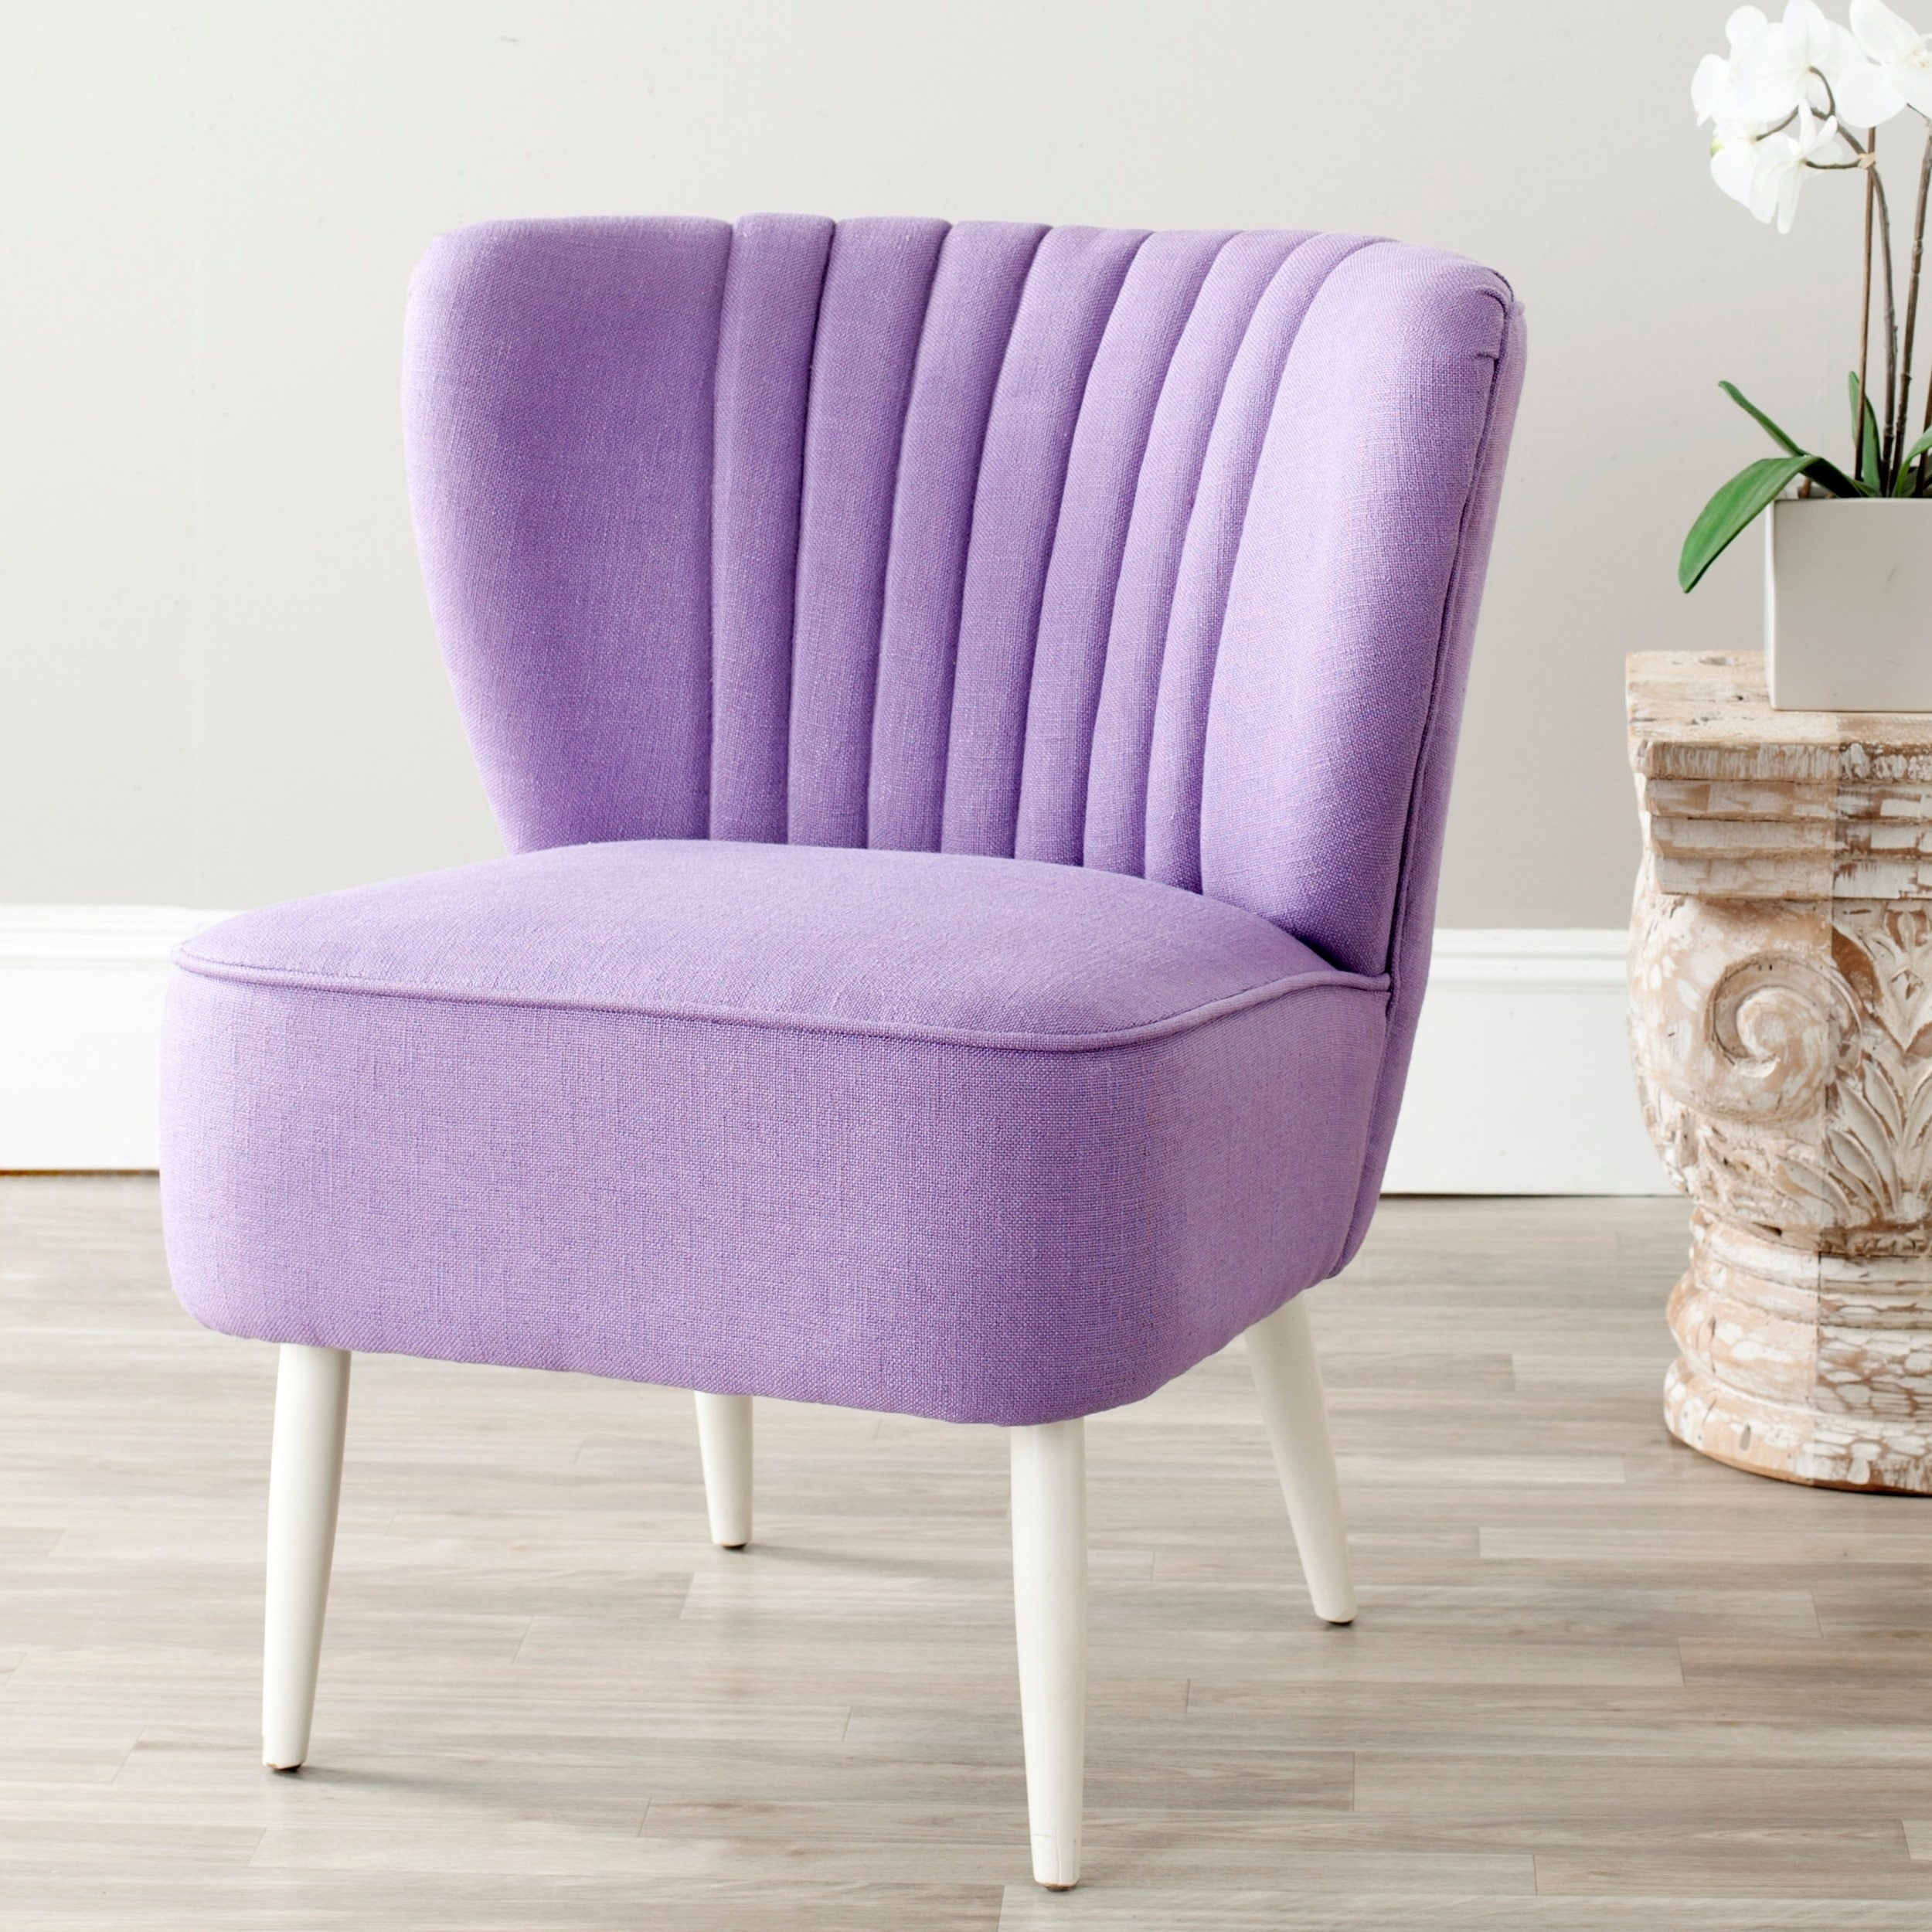 Safavieh Mid Century Purple Accent Chair 24 4 X 28 3 X 29 9 Overstock 6387522